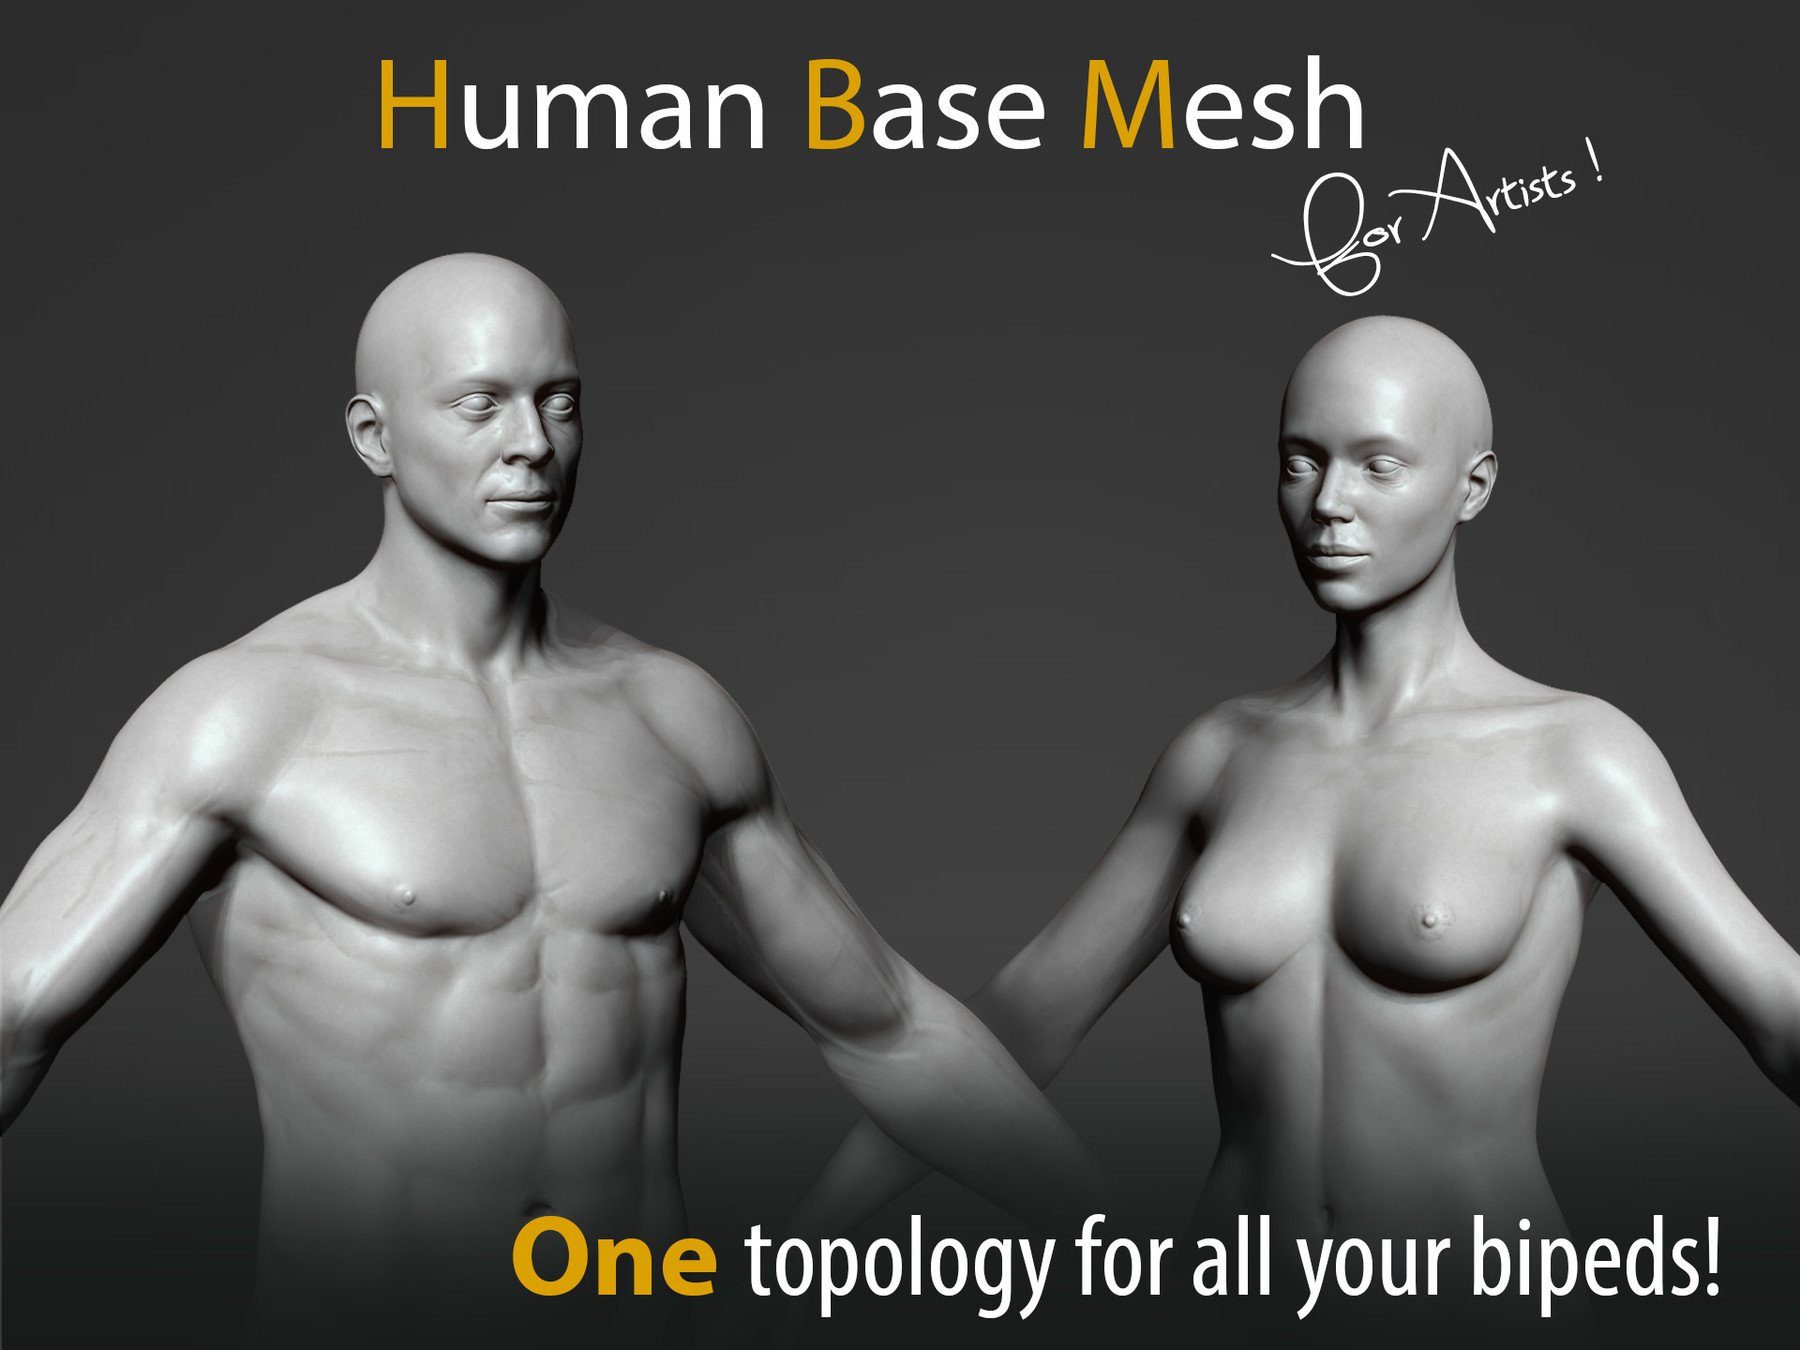 Human bm cover